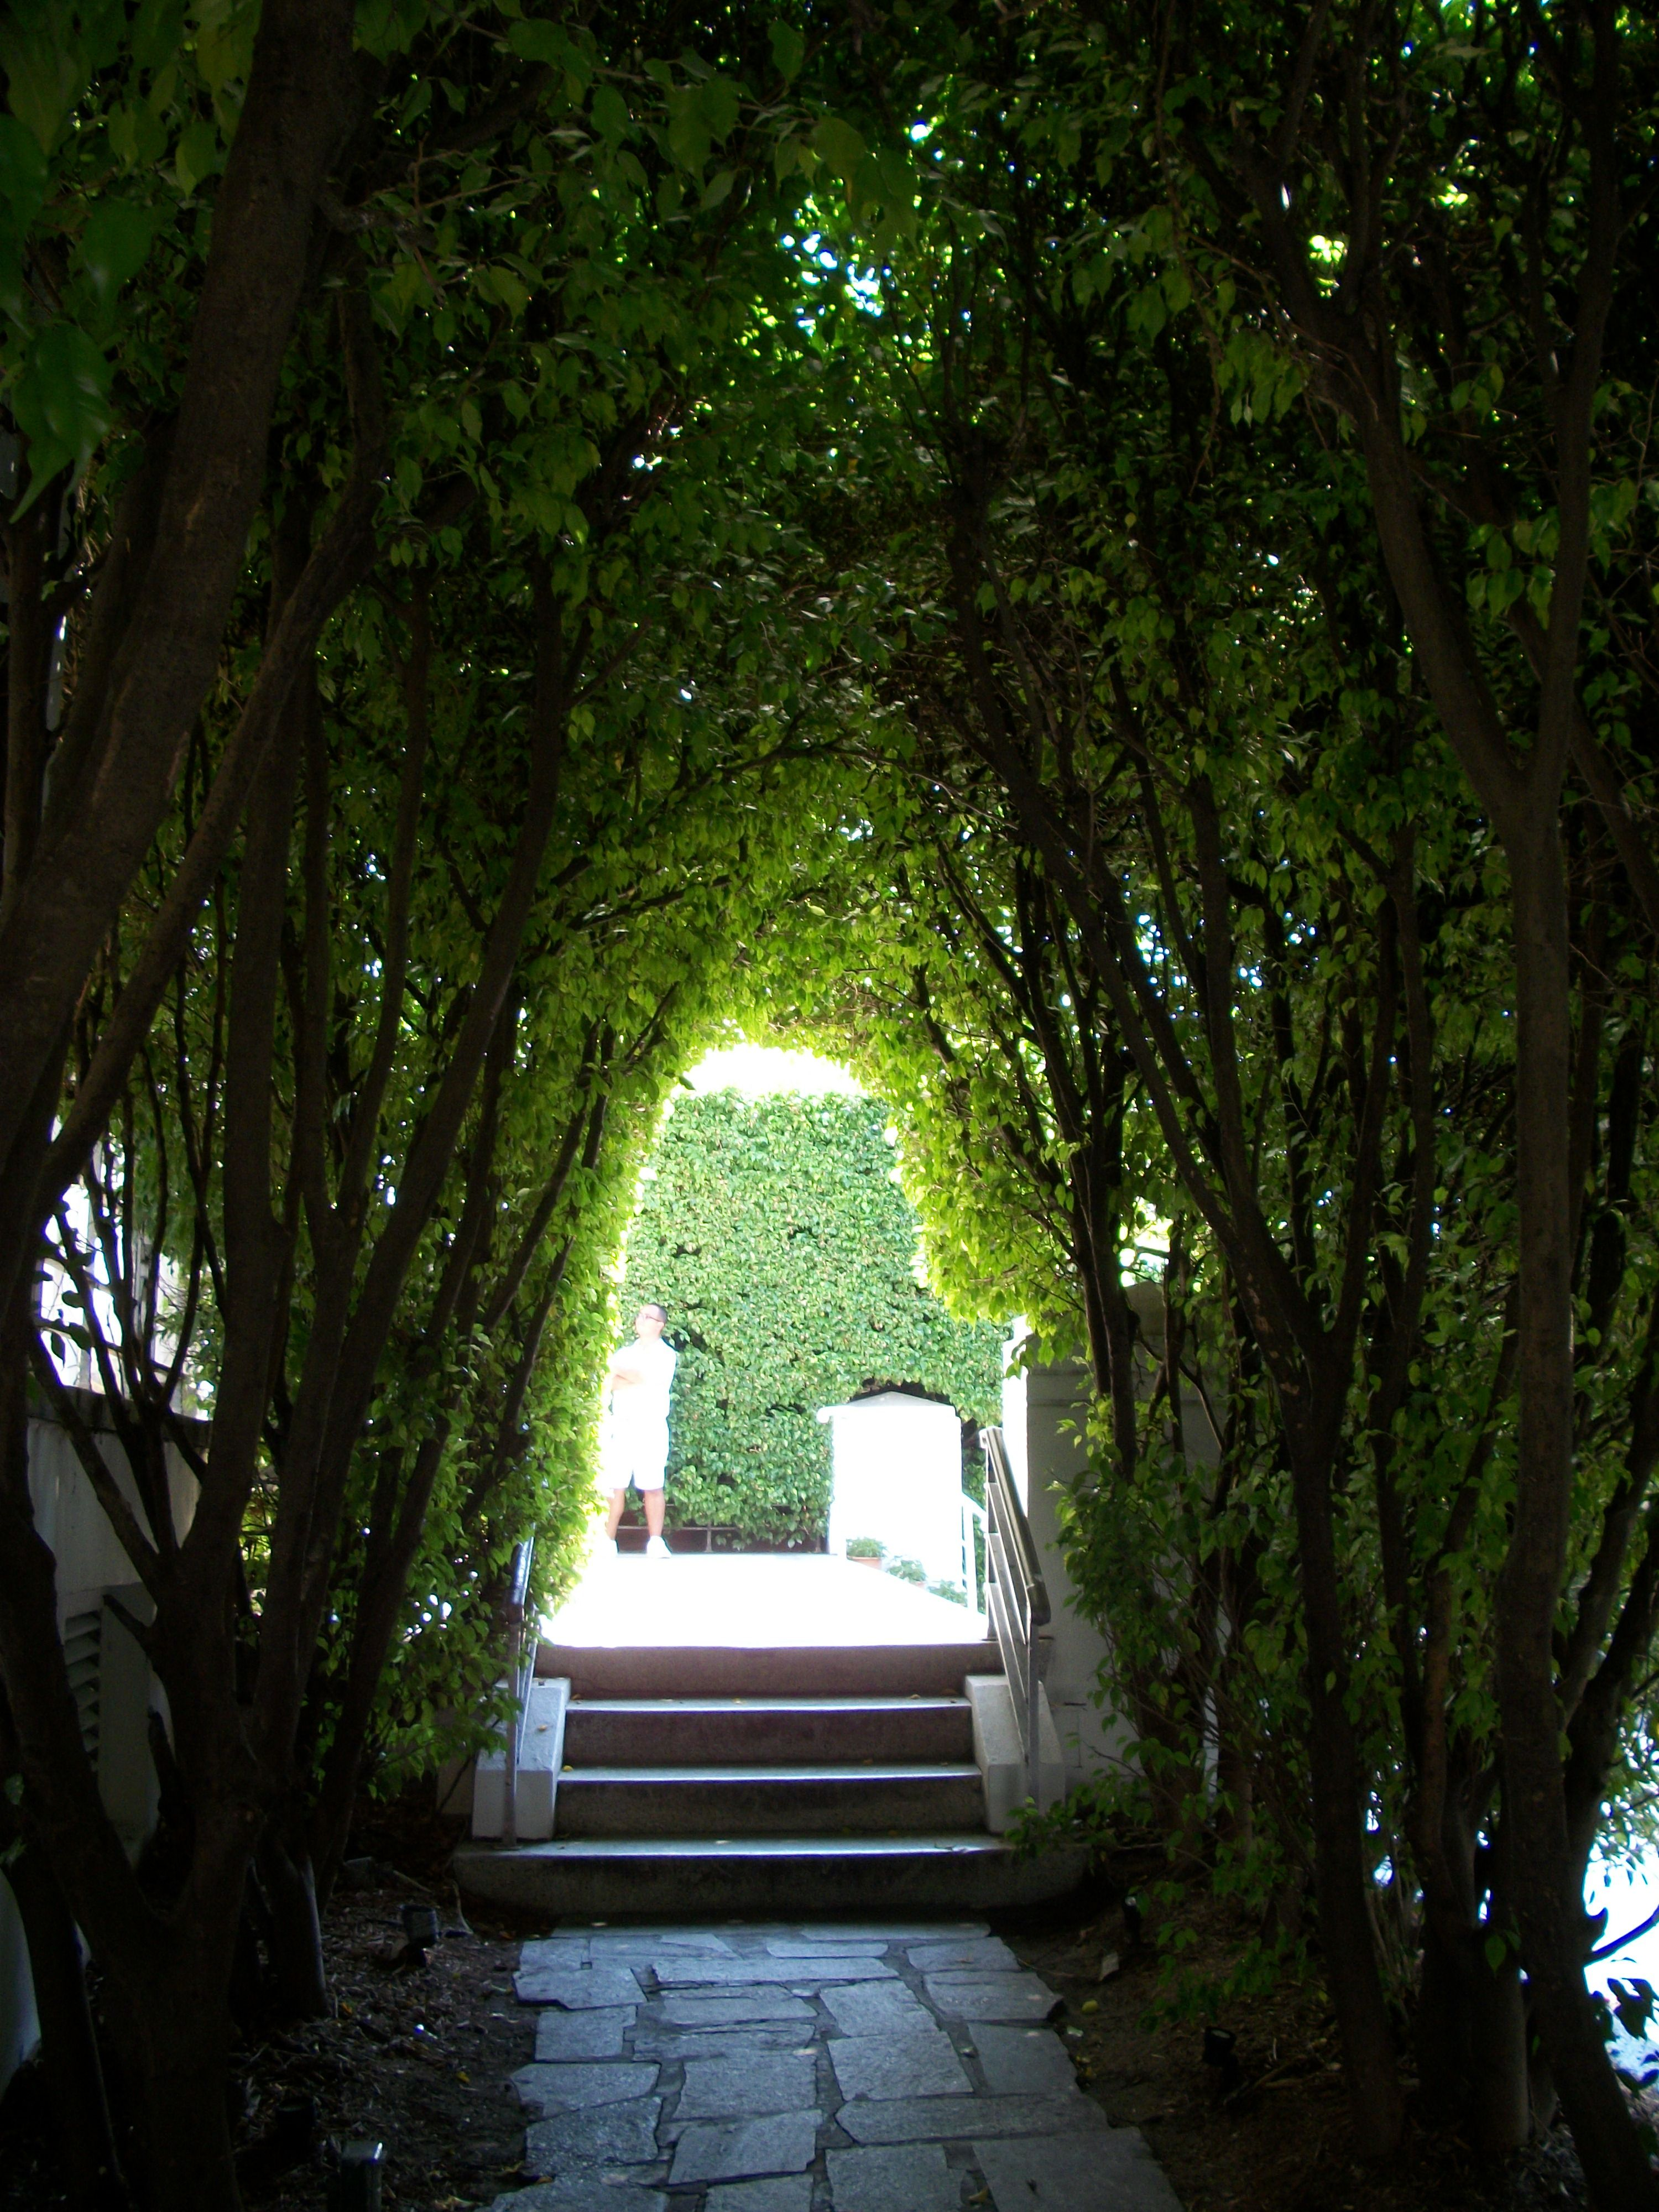 miami luxury naut nyc la image and gardens garden cheap nautilus in hotels sixty